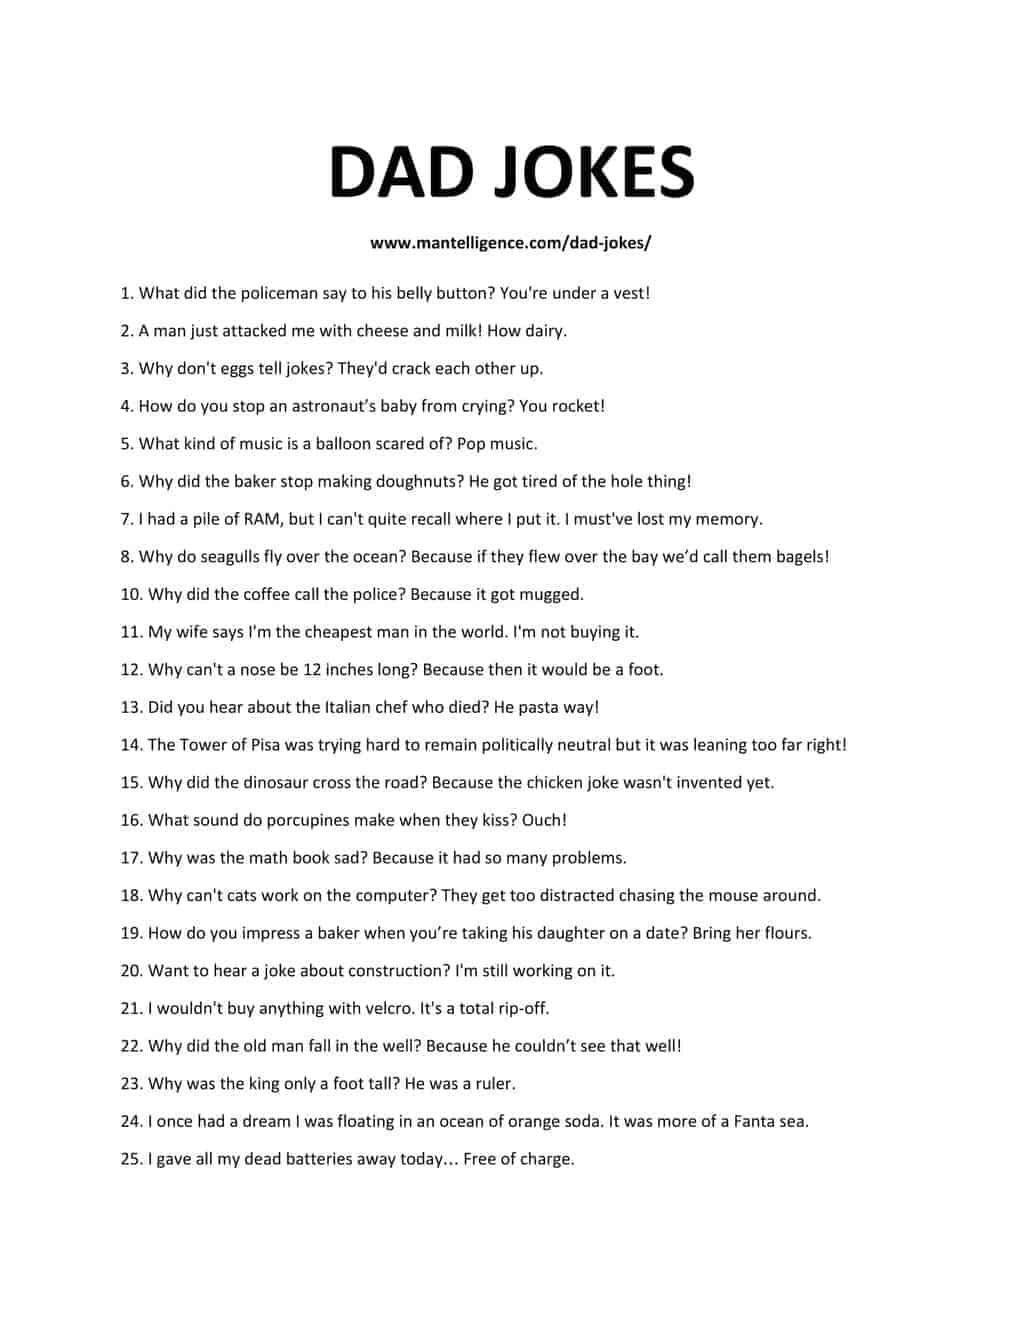 DAD_JOKES-1